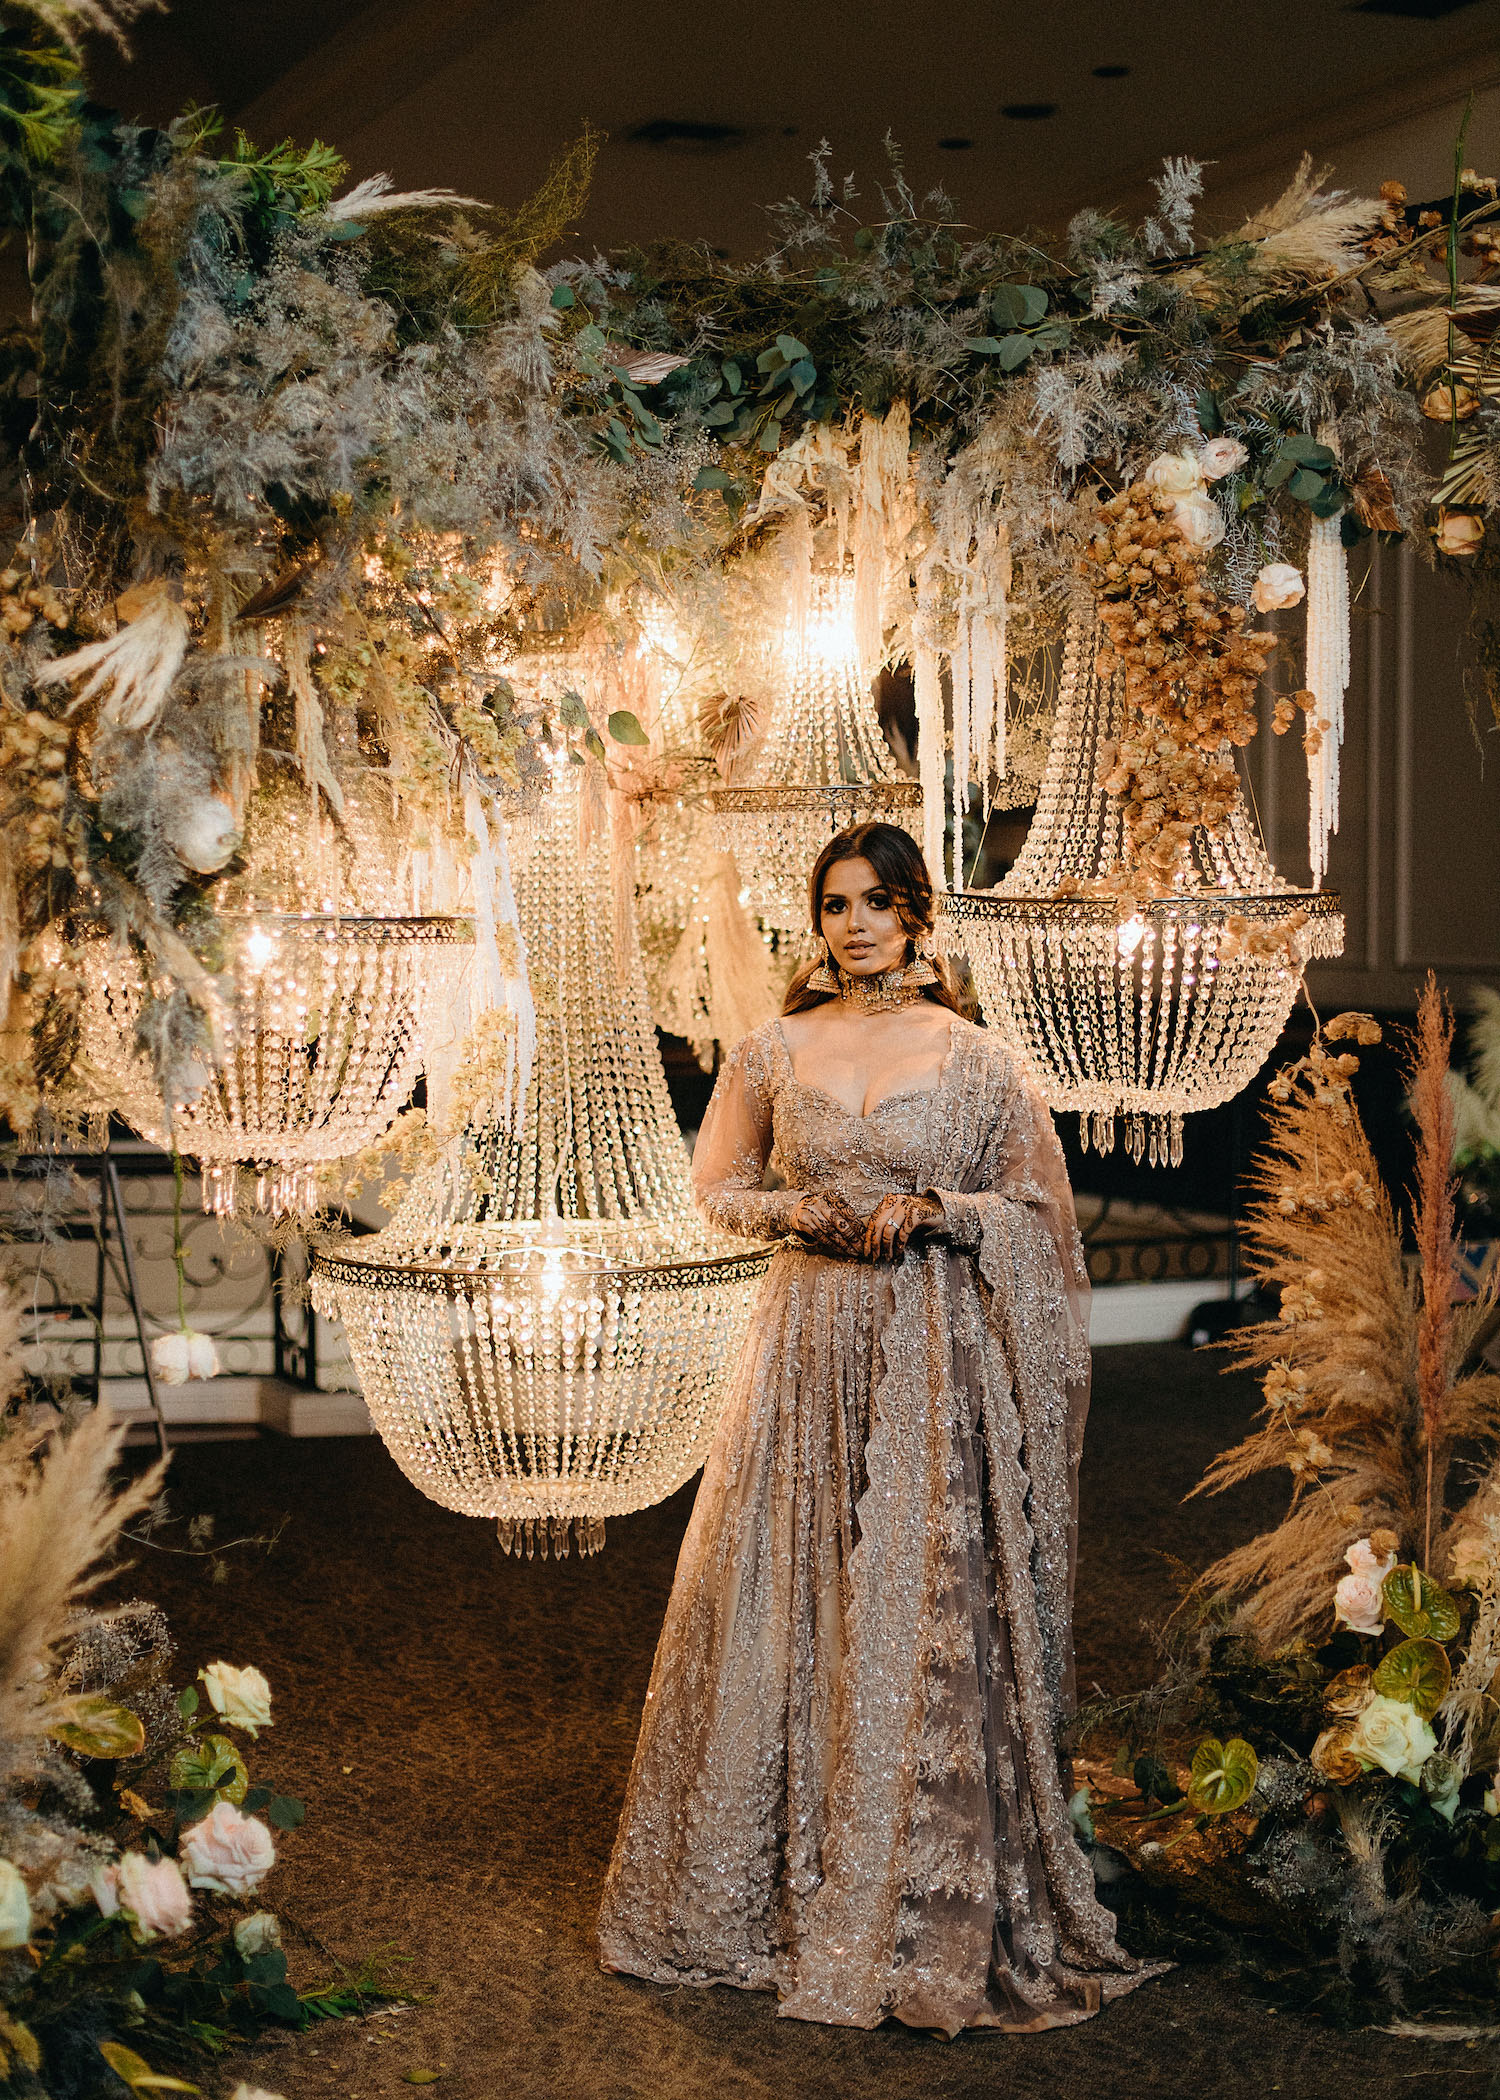 Gold Wedding Dress Bride